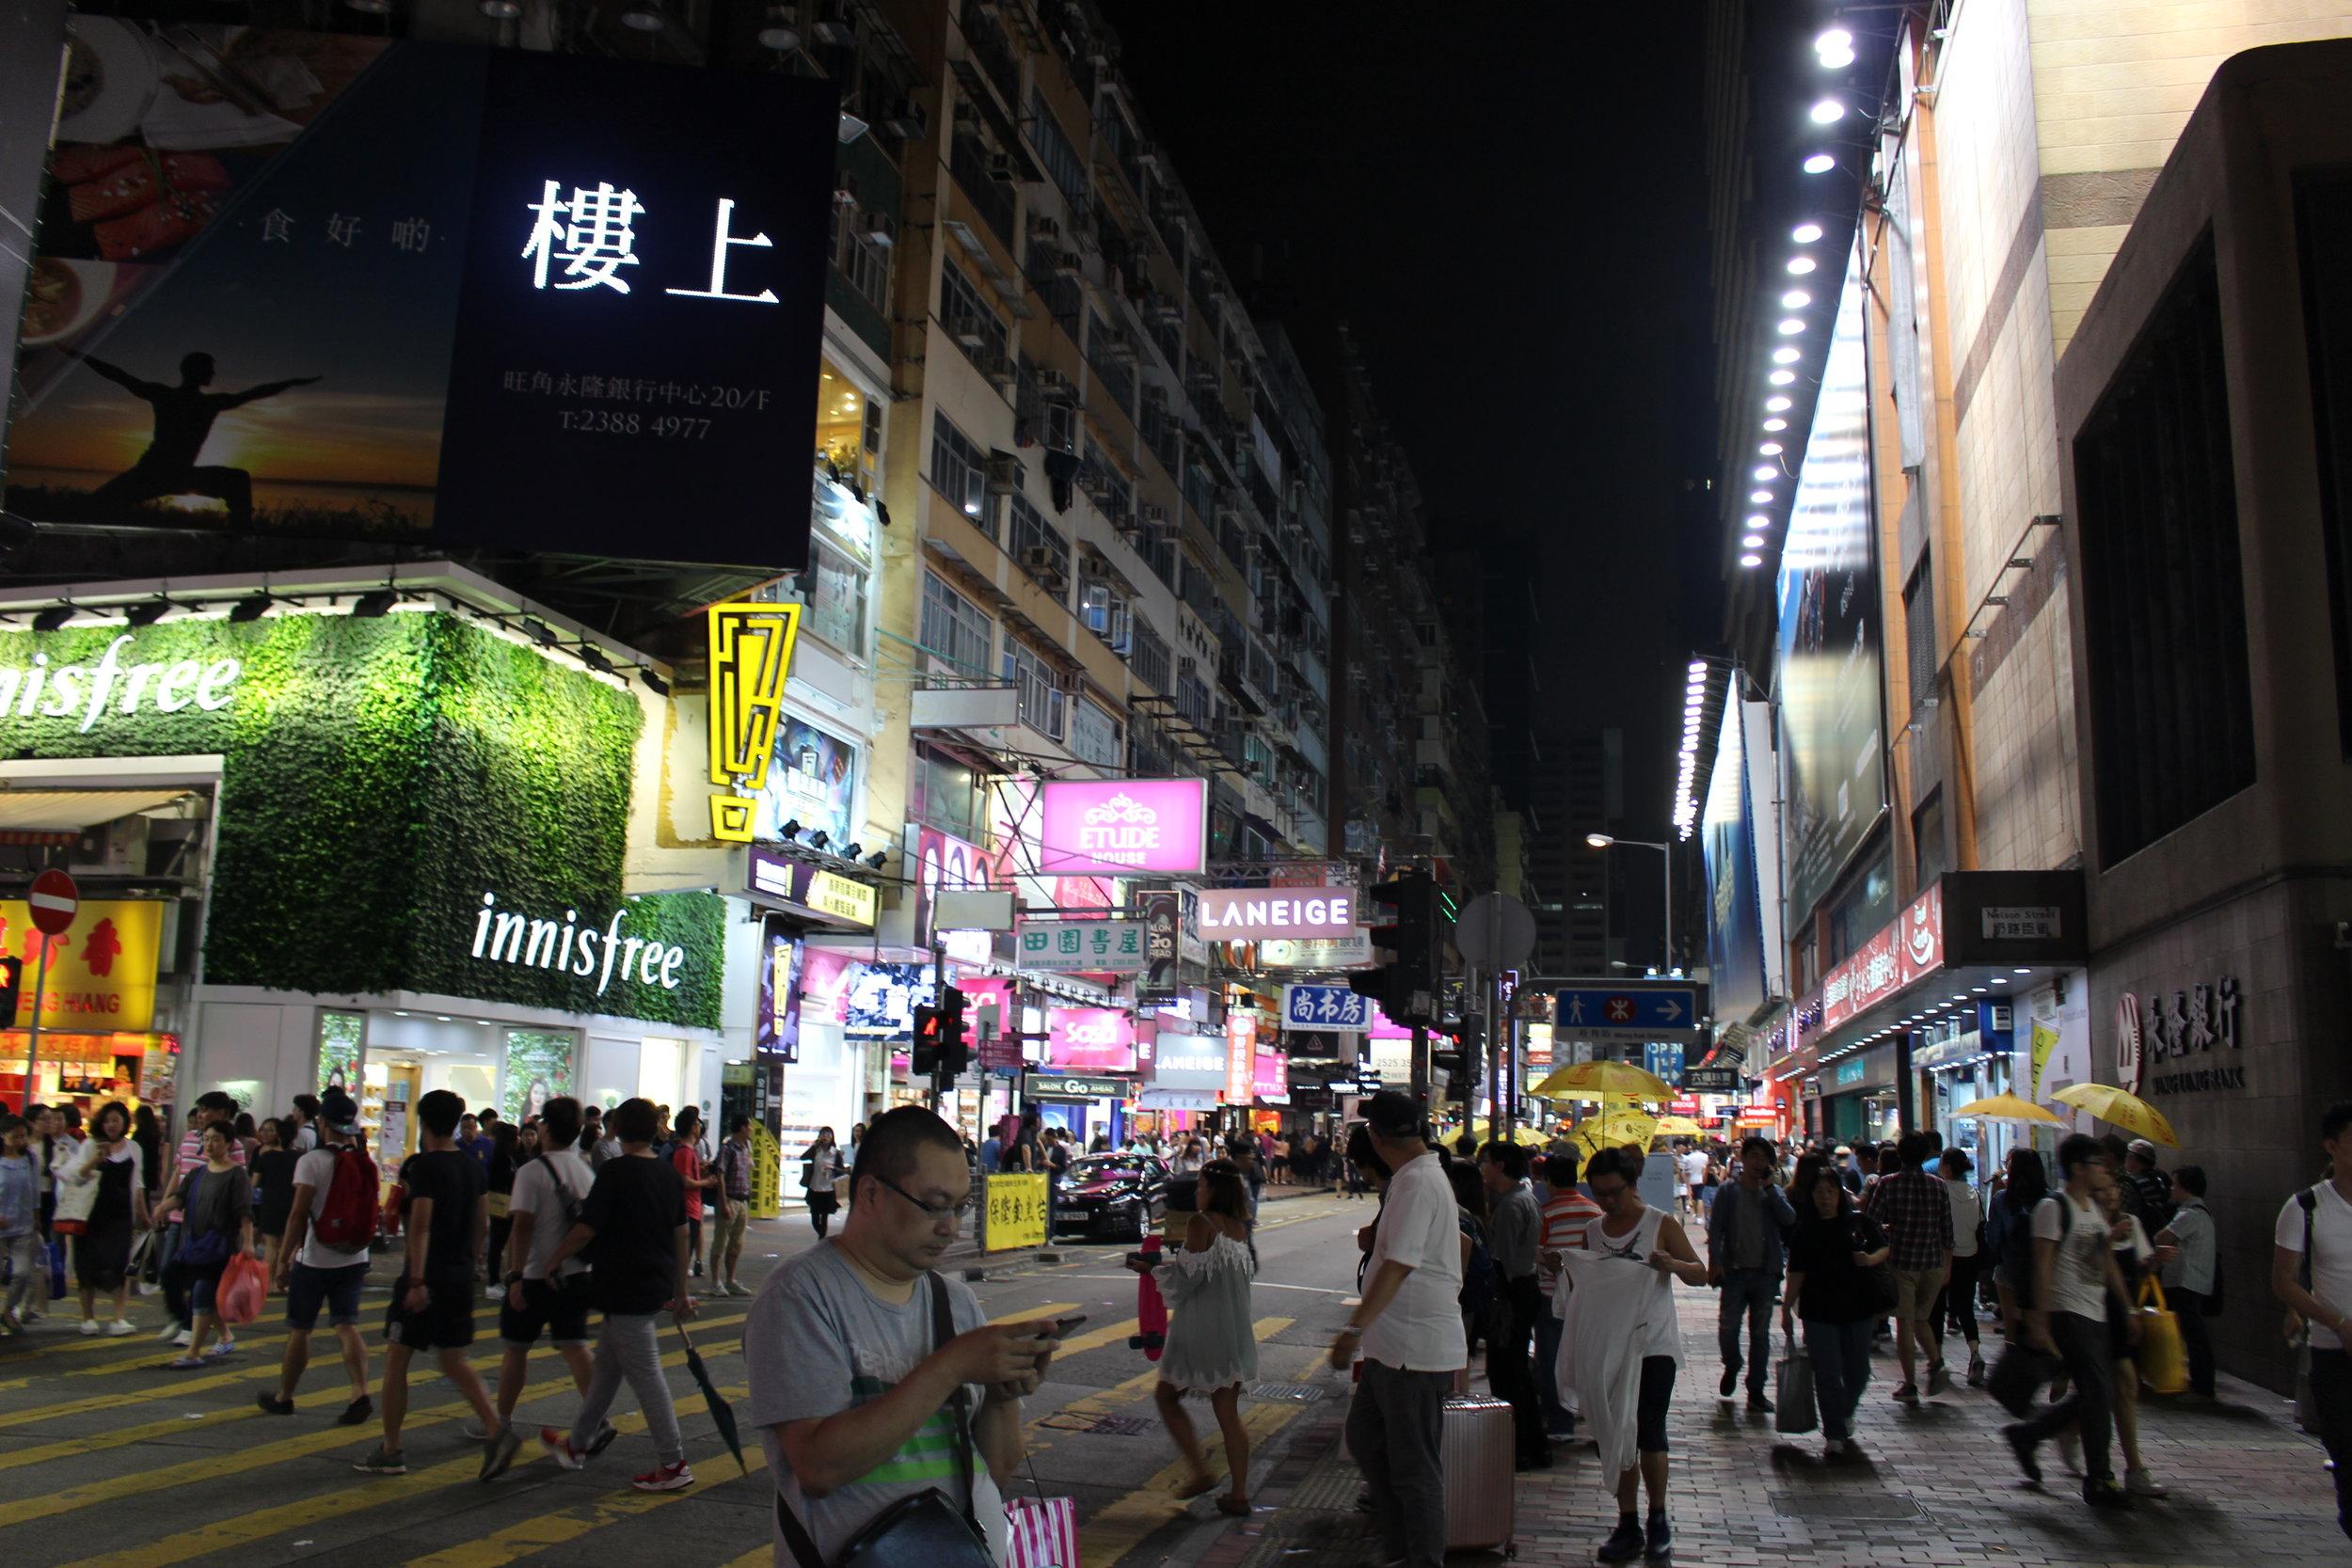 Walking through the downtown